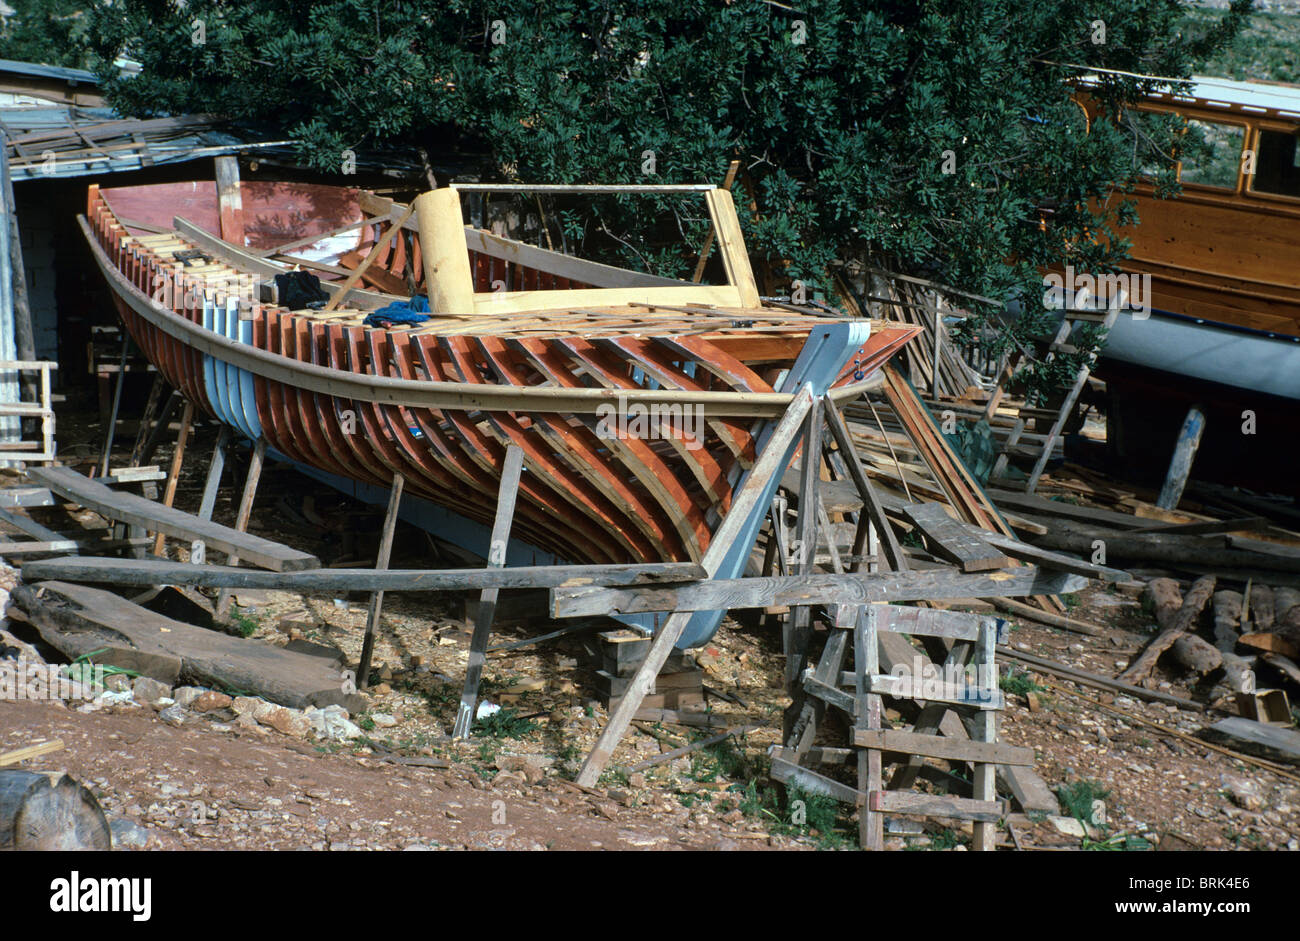 El esqueleto o marco de madera o barco Gullet en construcción en un ...